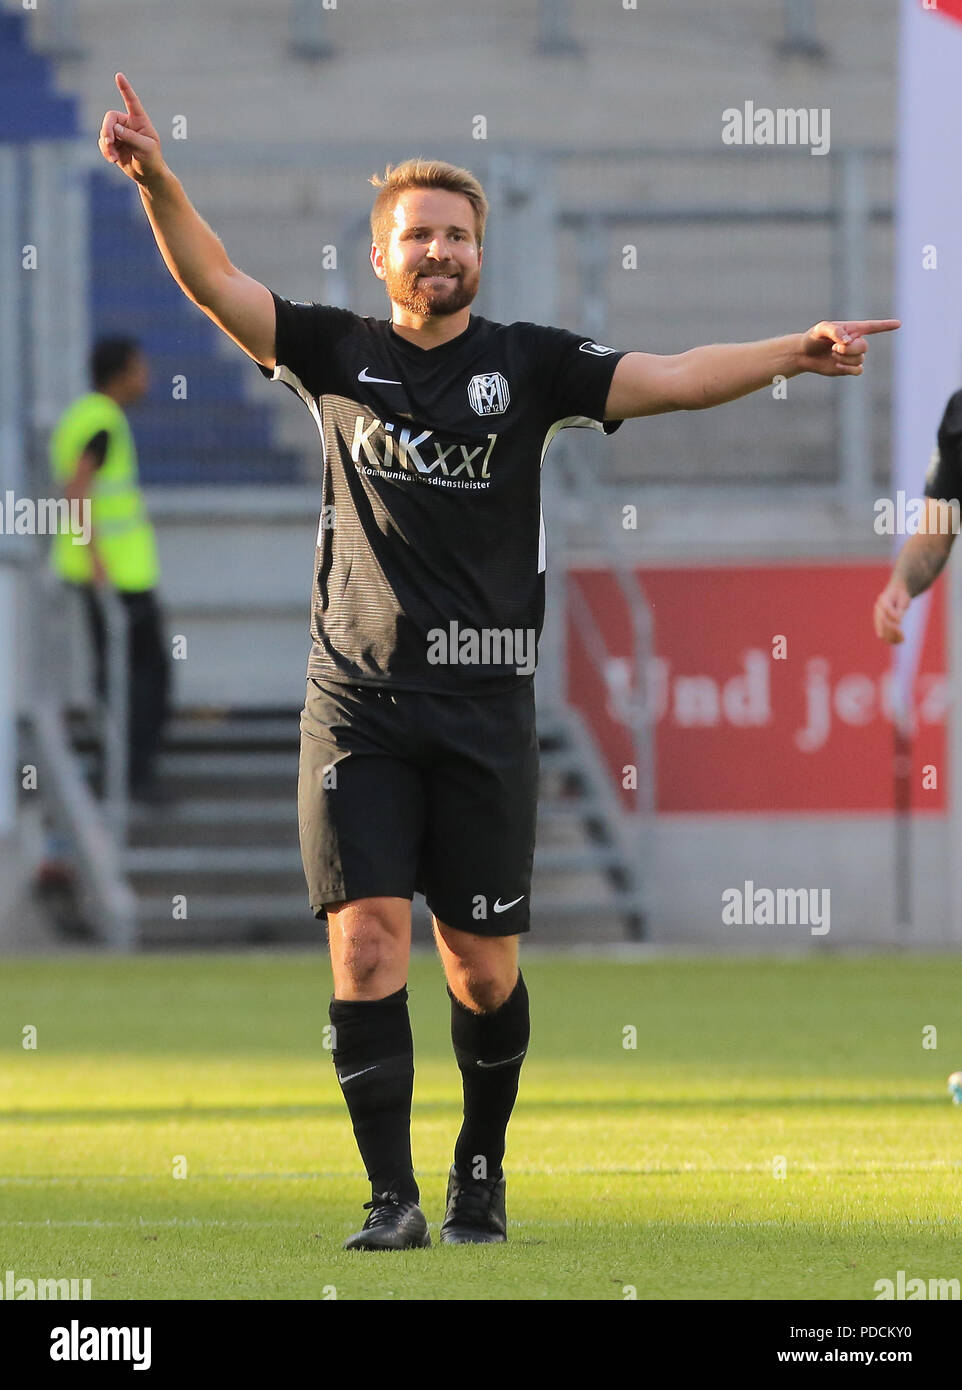 Duisburg, Germany. 08th Aug, 2018. Duisburg, Germany August 8 2018, 3rd league matchday 3, KFC Uerdingen 05 vs SV Meppen: Thilo Leugers (SVM) gestures. Credit: Juergen Schwarz/Alamy Live News - Stock Image